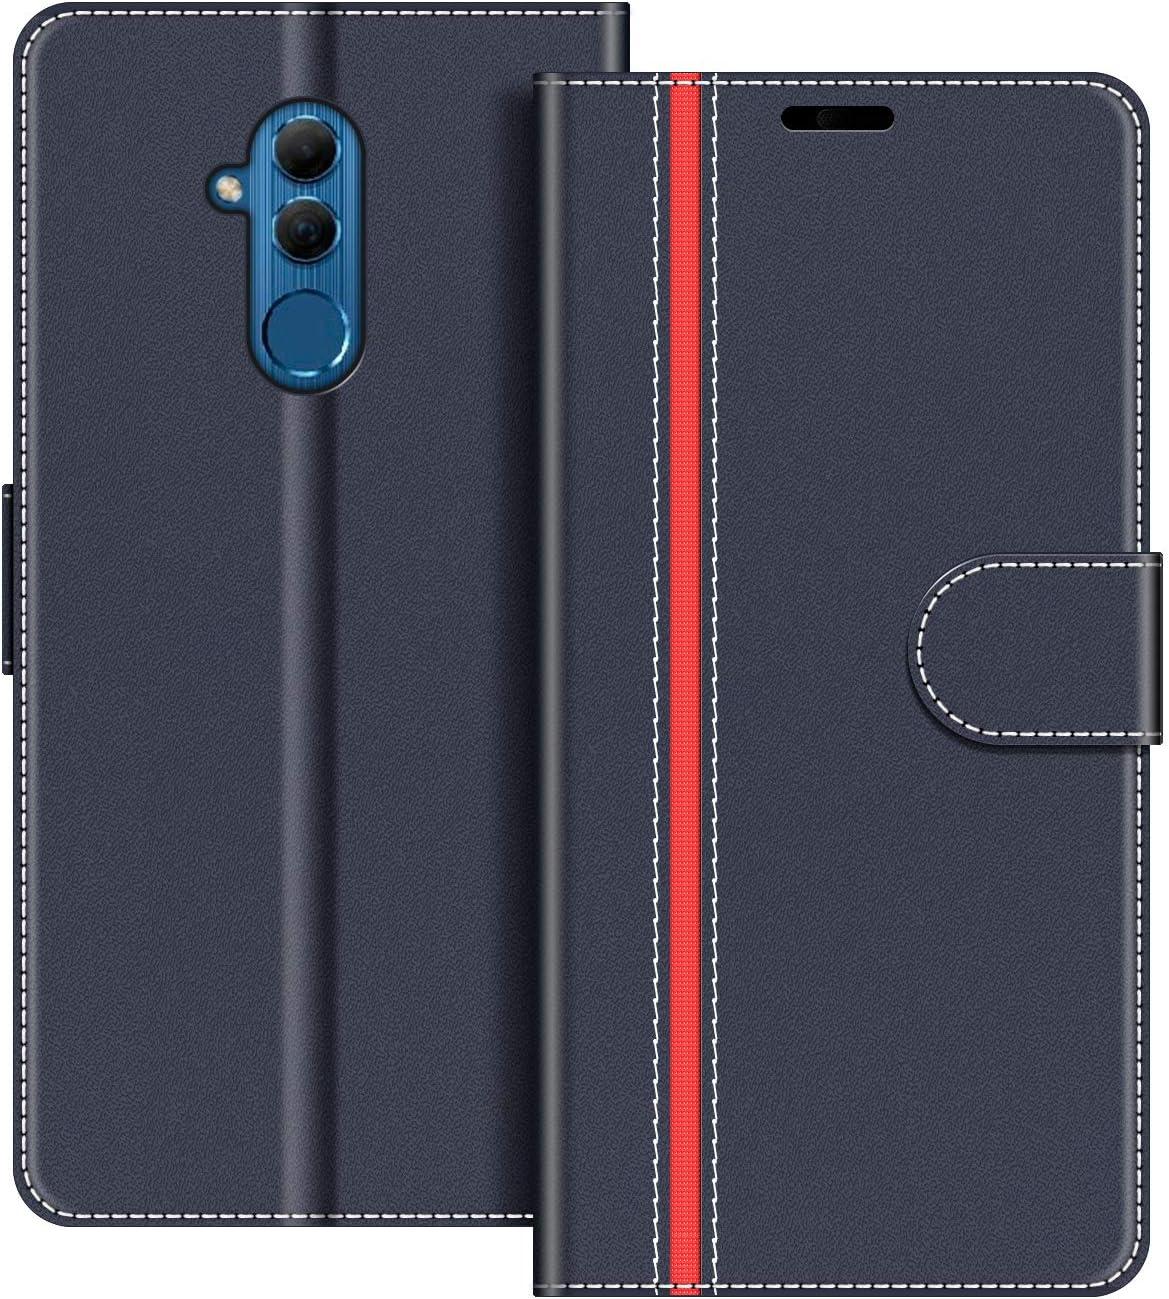 COODIO Funda Huawei Mate 20 Lite con Tapa, Funda Movil Huawei Mate20 Lite, Funda Libro Huawei Mate 20 Lite Carcasa Magnético Funda para Huawei Mate 20 Lite, Azul Oscuro/Rojo